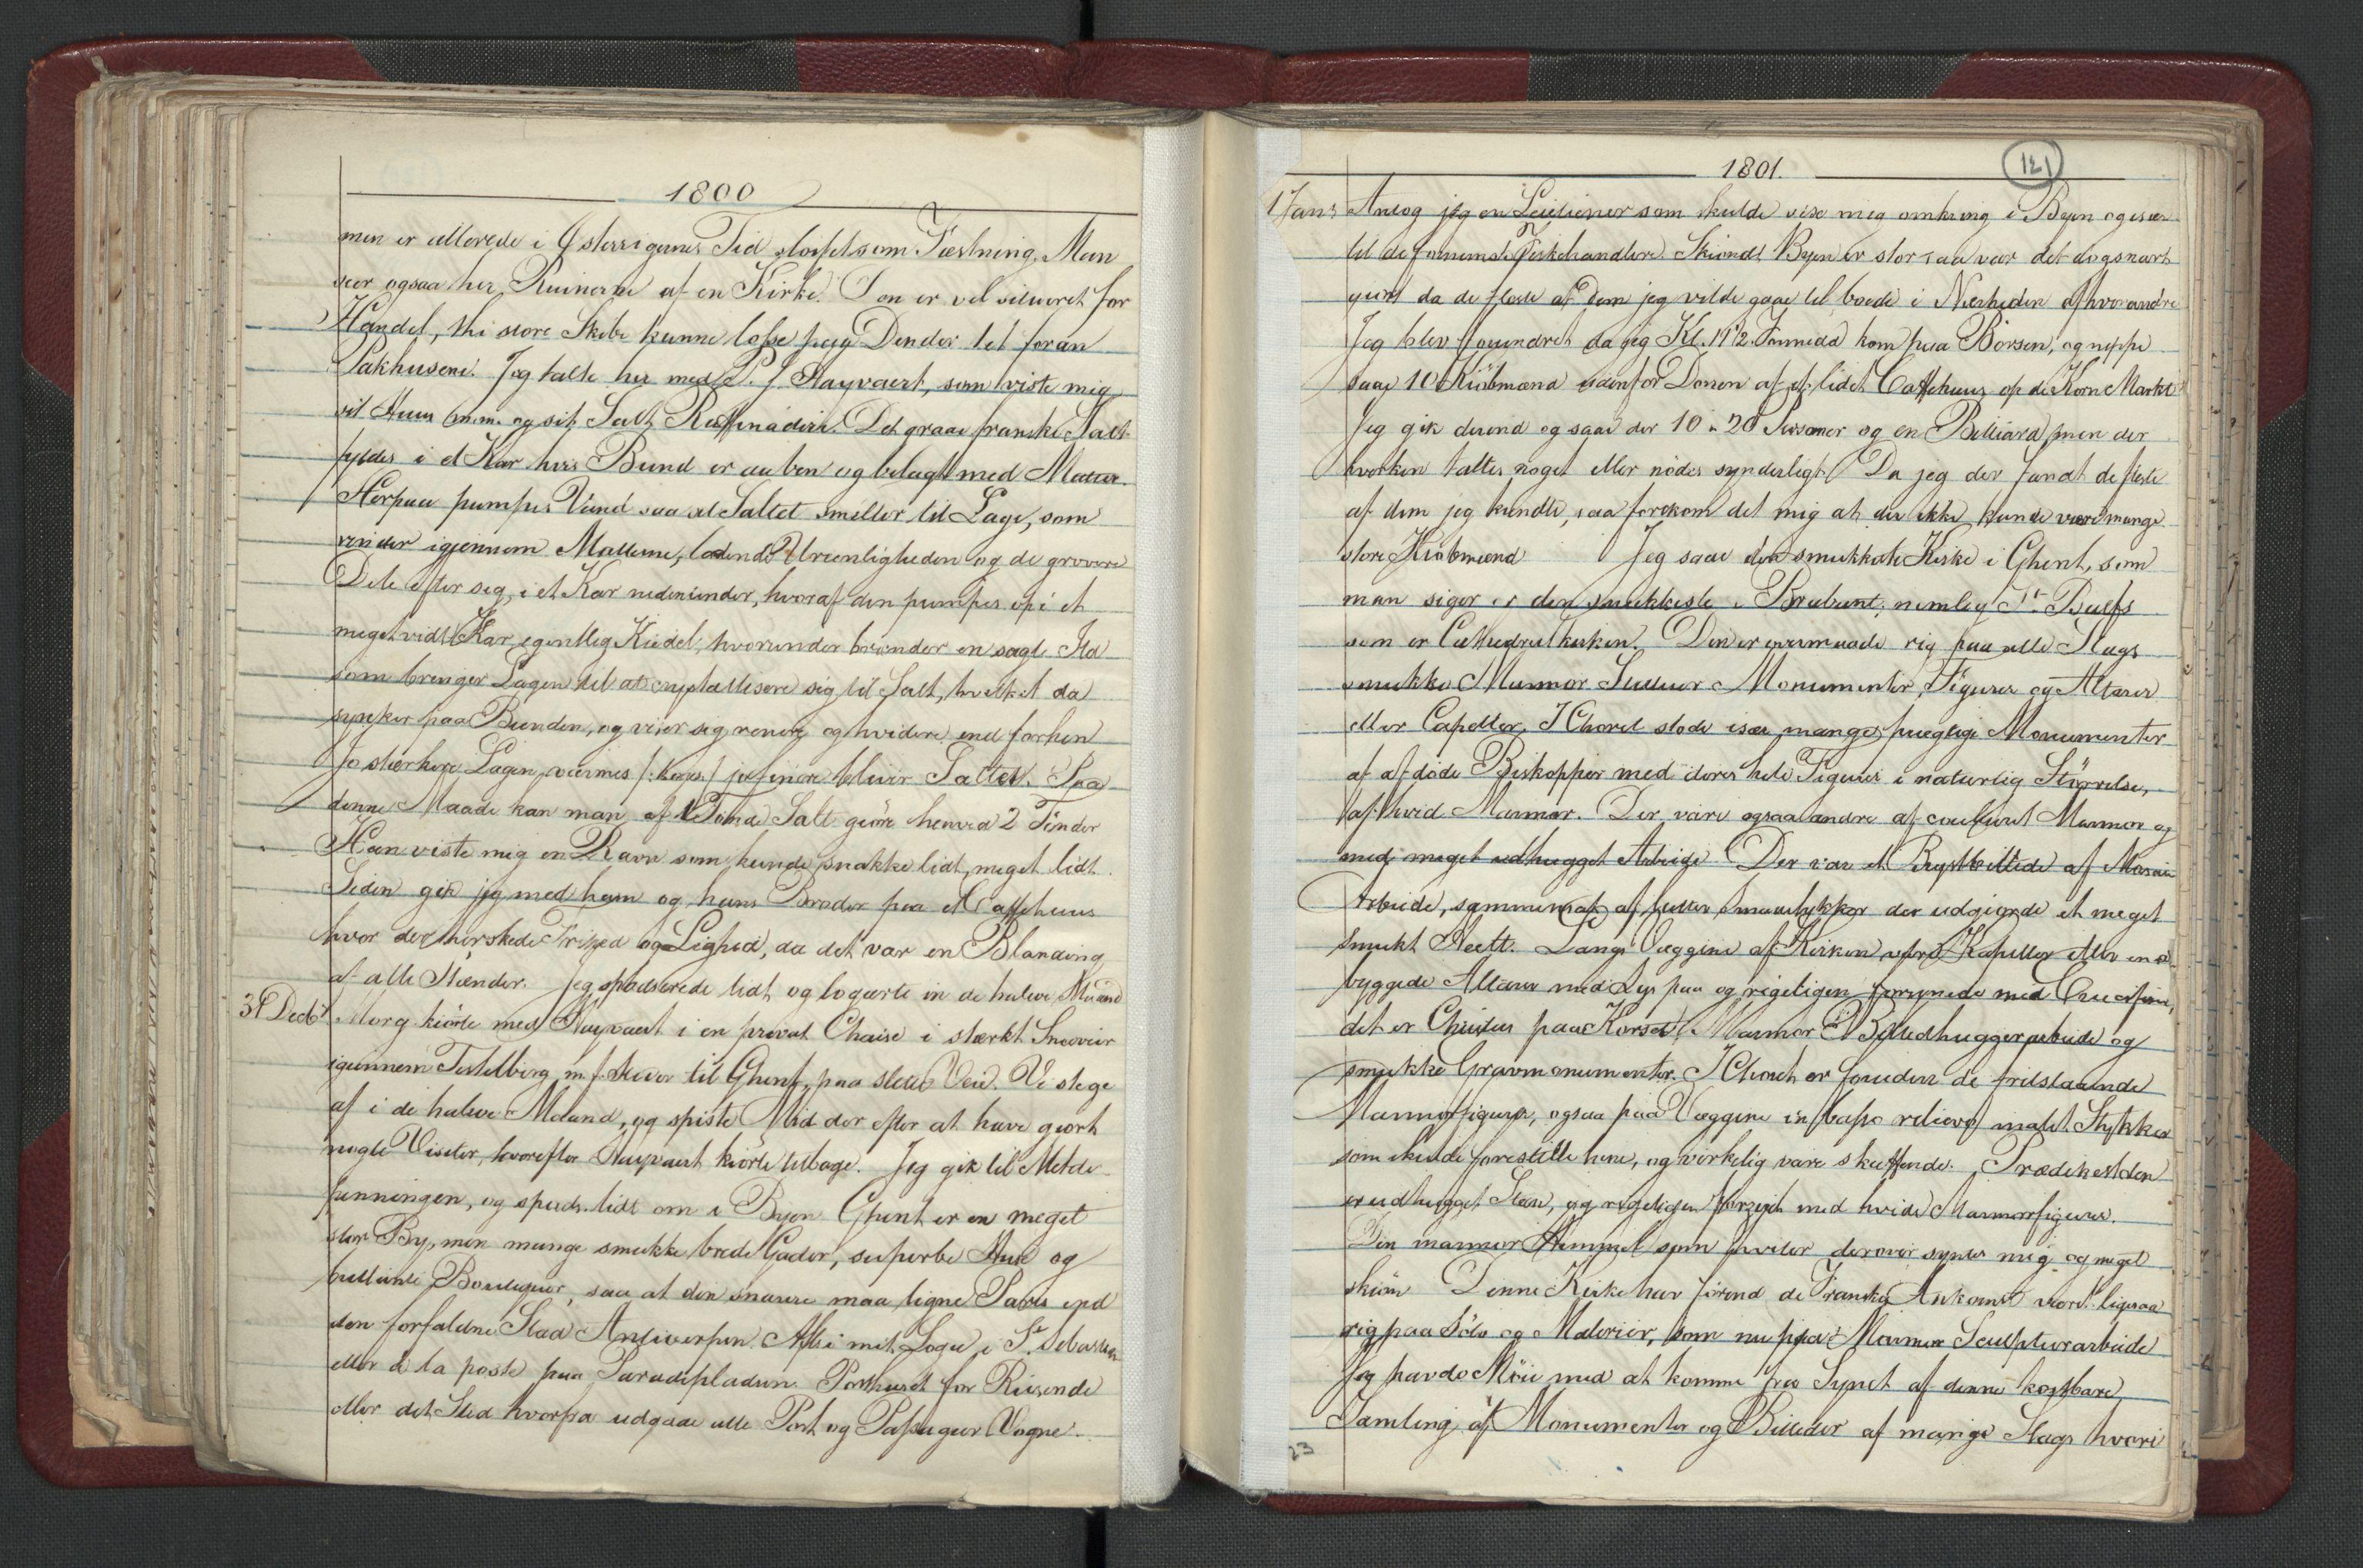 RA, Meltzer, Fredrik, F/L0001: Dagbok for årene 1796-1808, 1811, 1817, 1796-1817, s. 120b-121a